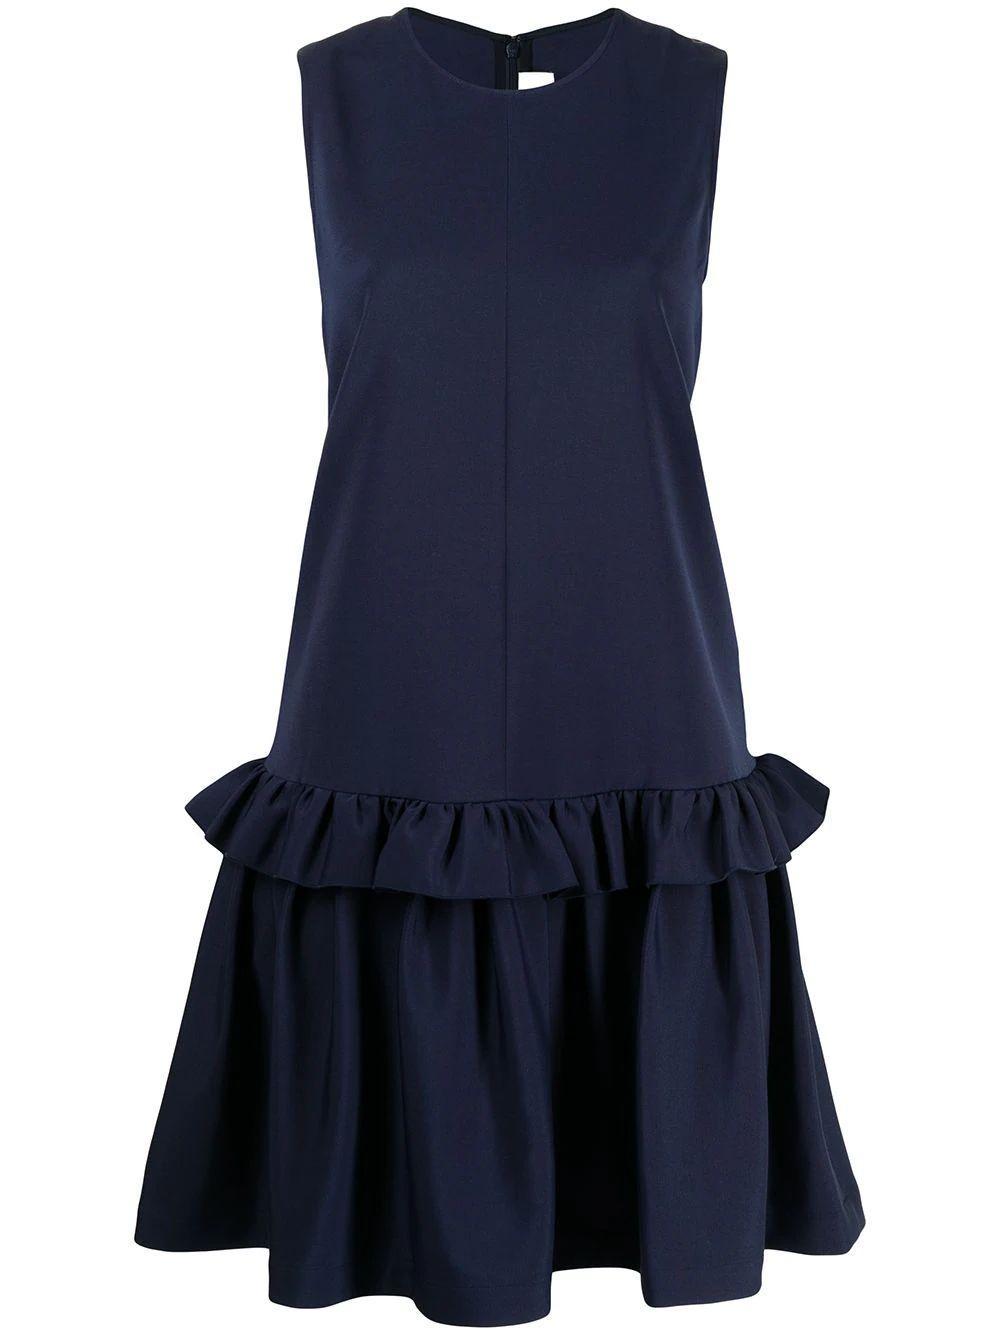 Faille Flounce Hem Dress Item # 2221WDR002556C